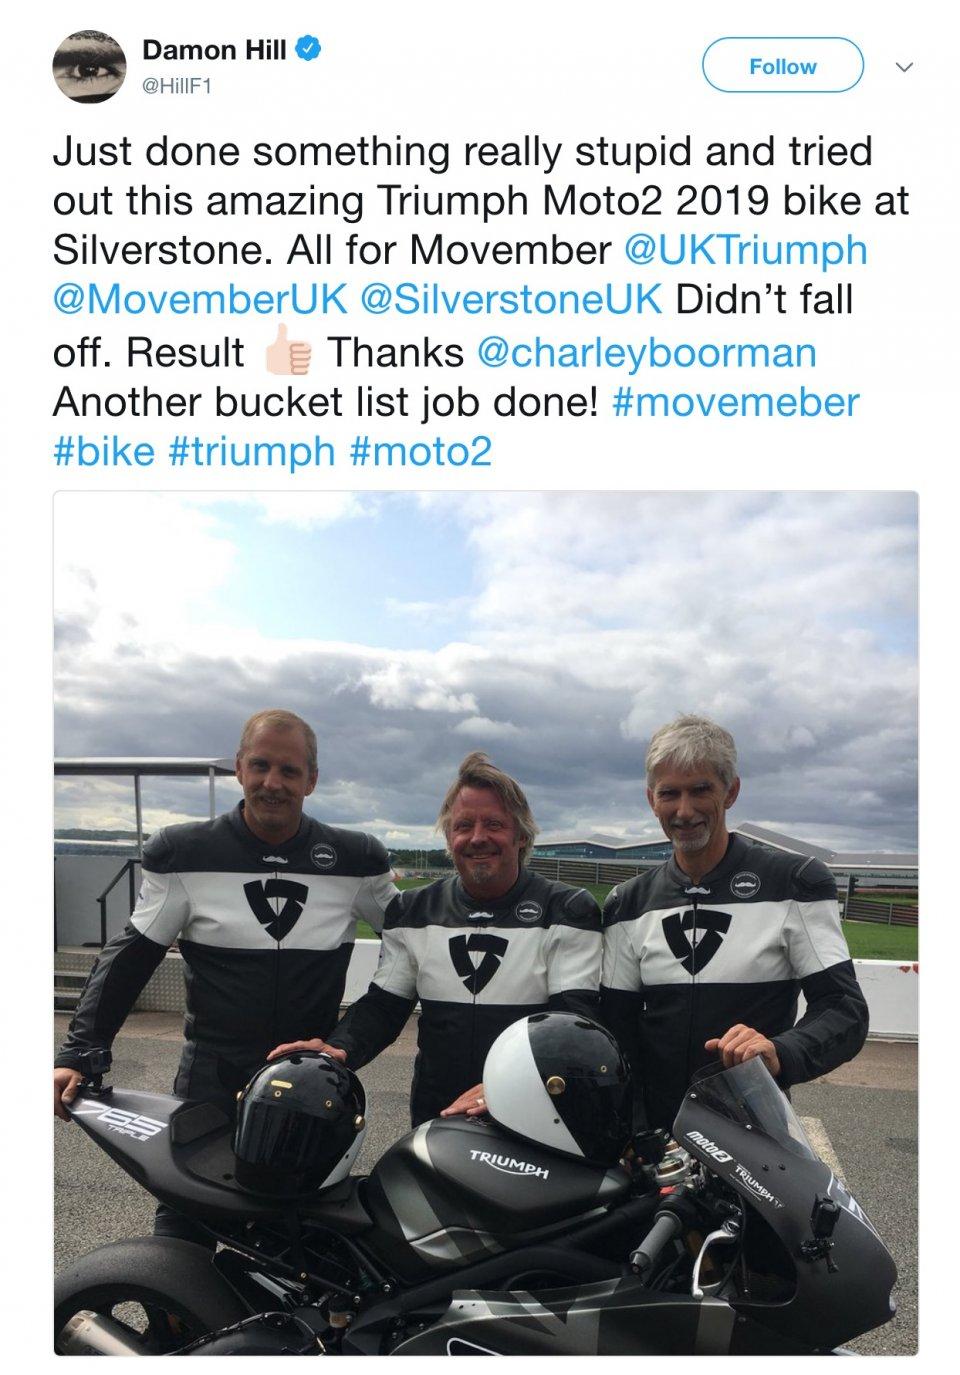 Moto2: Damon Hill, from F1 to Triumph Moto2 at Silverstone